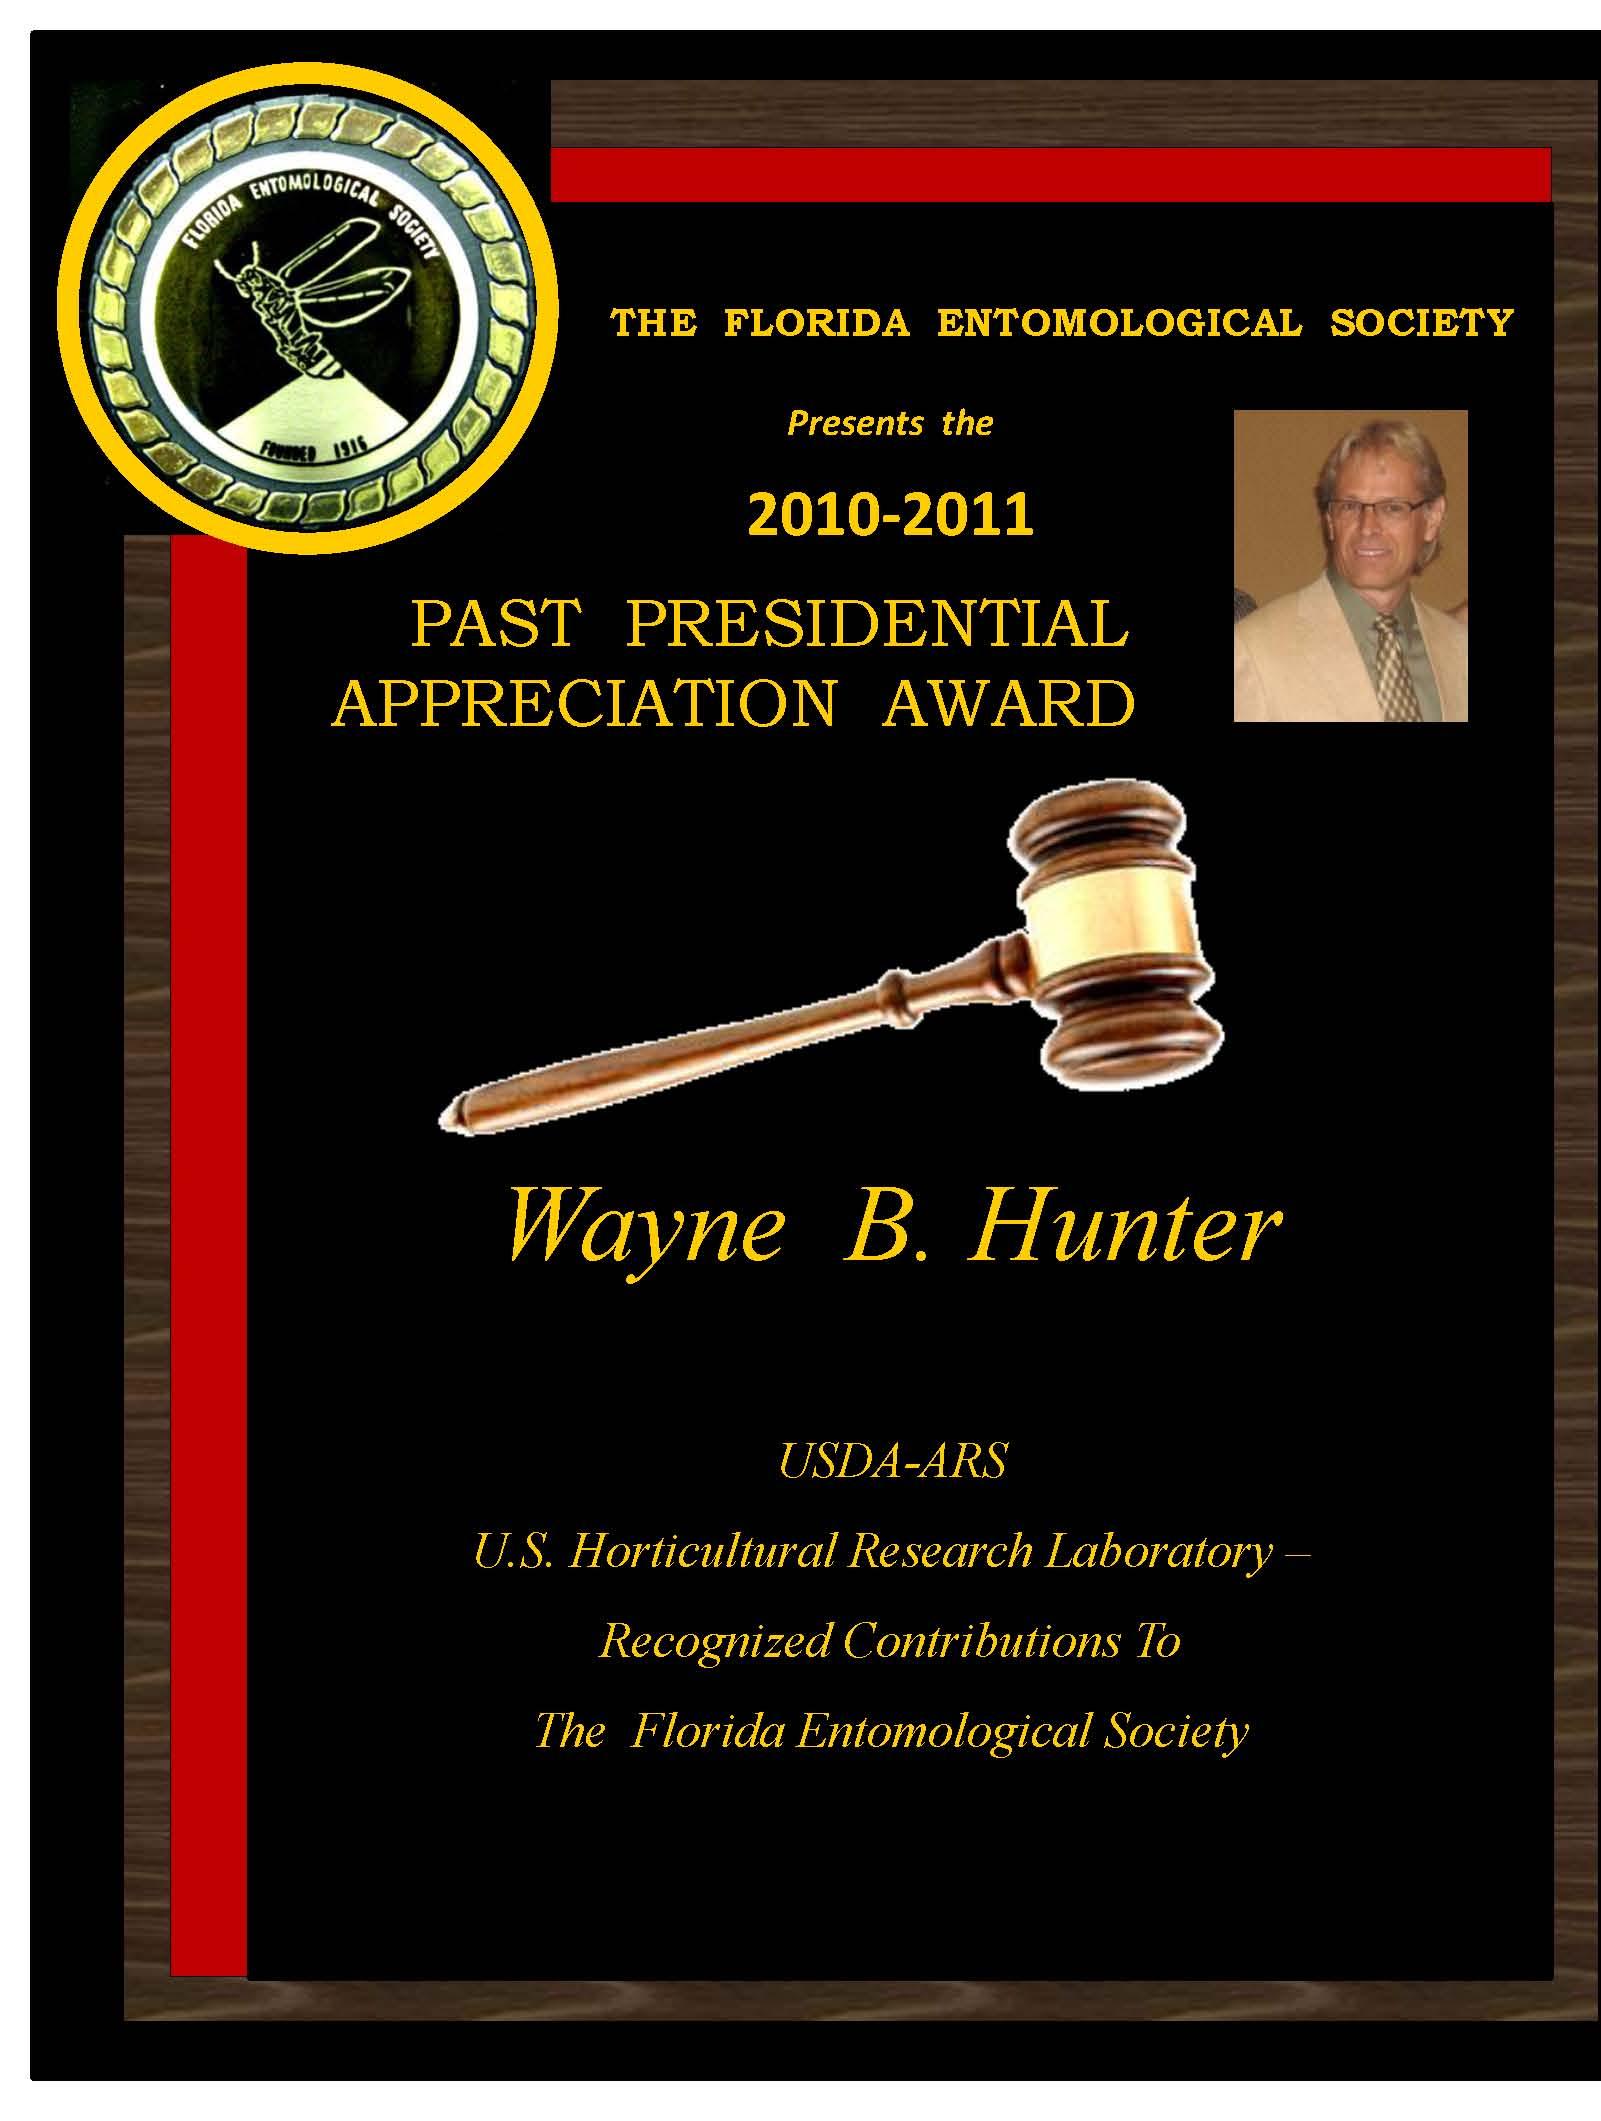 Wayne Hunter Past President Award